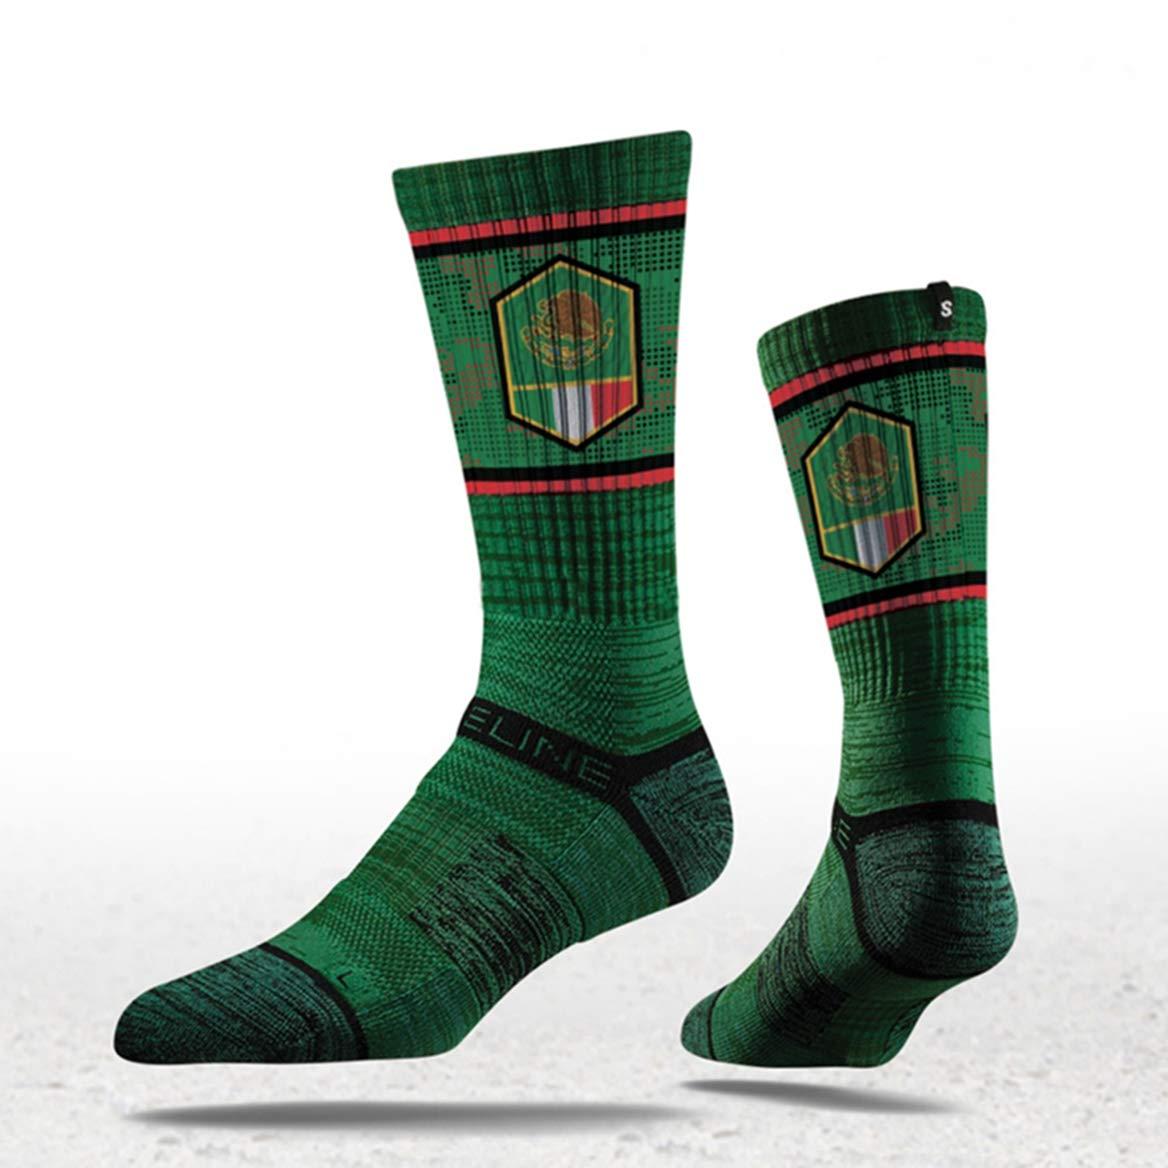 Mexico Flag Crew Socks Strideline S Collection